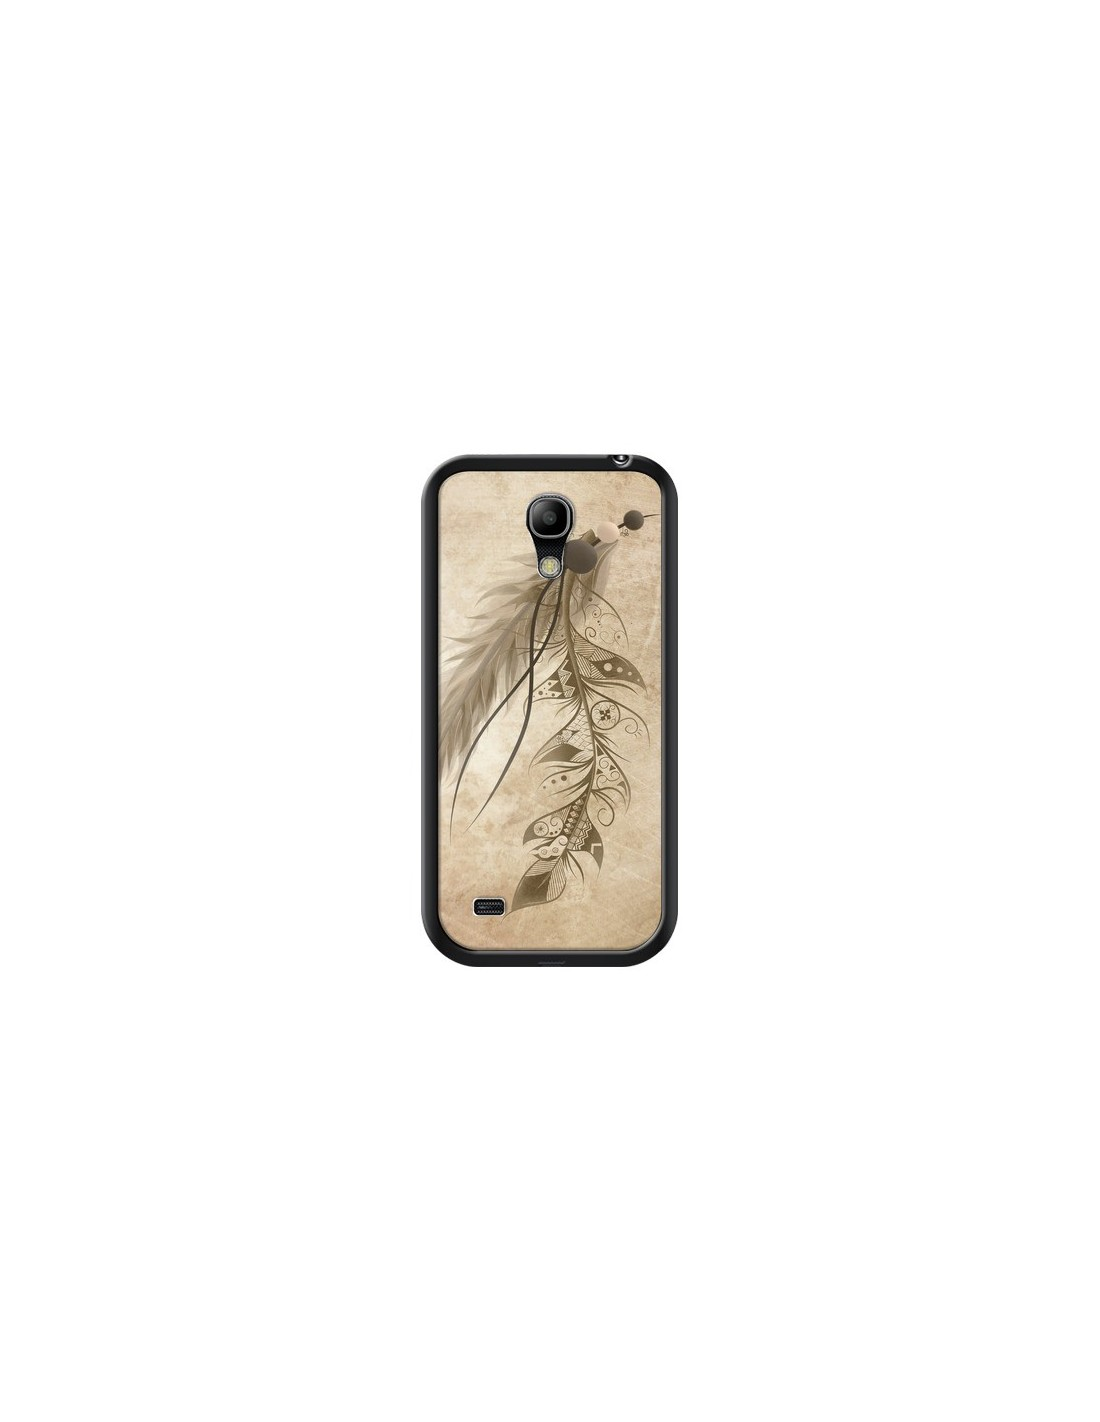 Coque Bohemian Feather Plume Attrape Reves pour Samsung Galaxy S4 Mini - LouJah